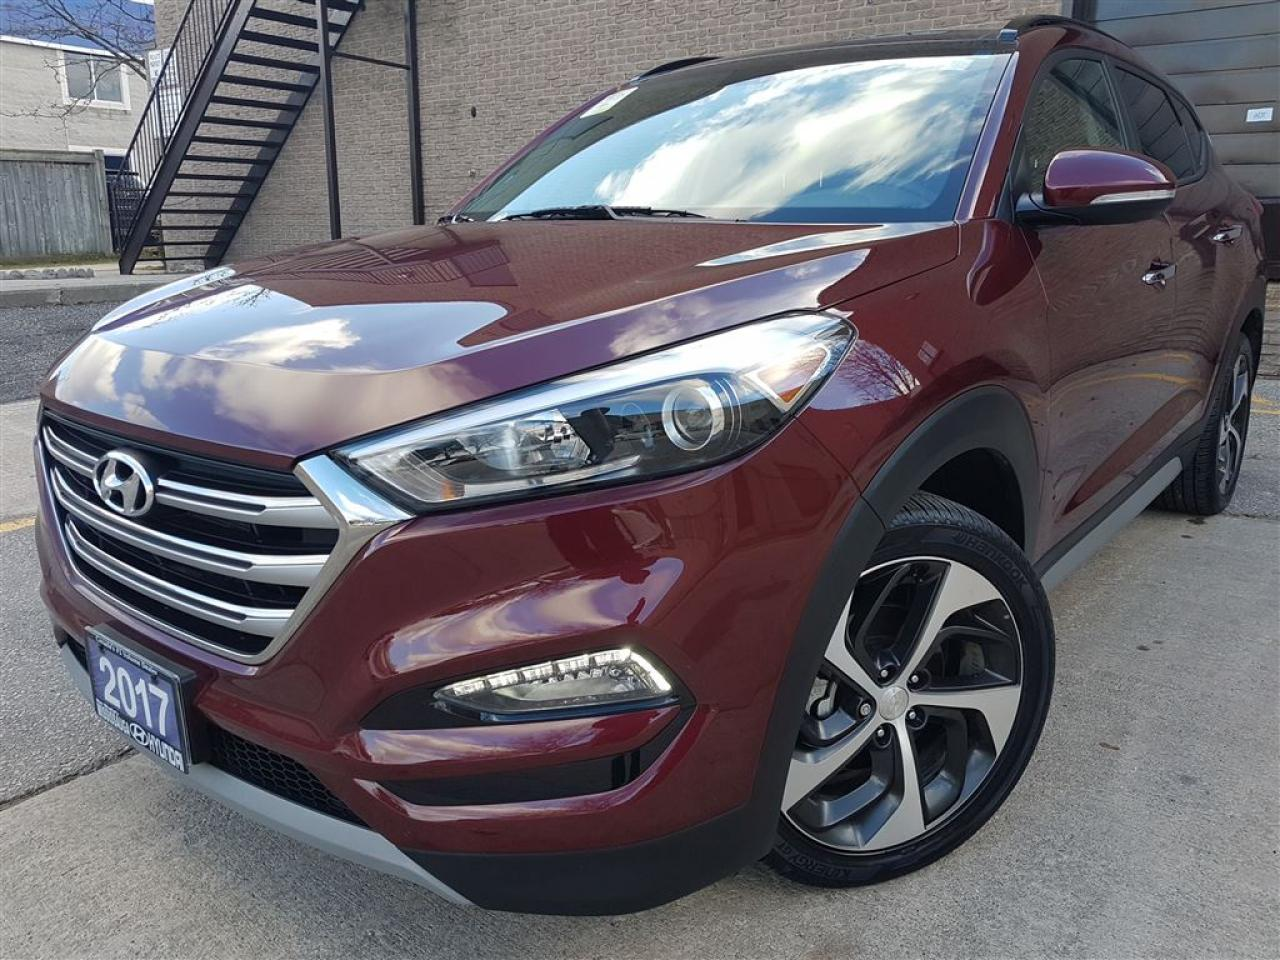 2017 Hyundai Tucson SE 1.6 Turbo-Panorama roof-Leather